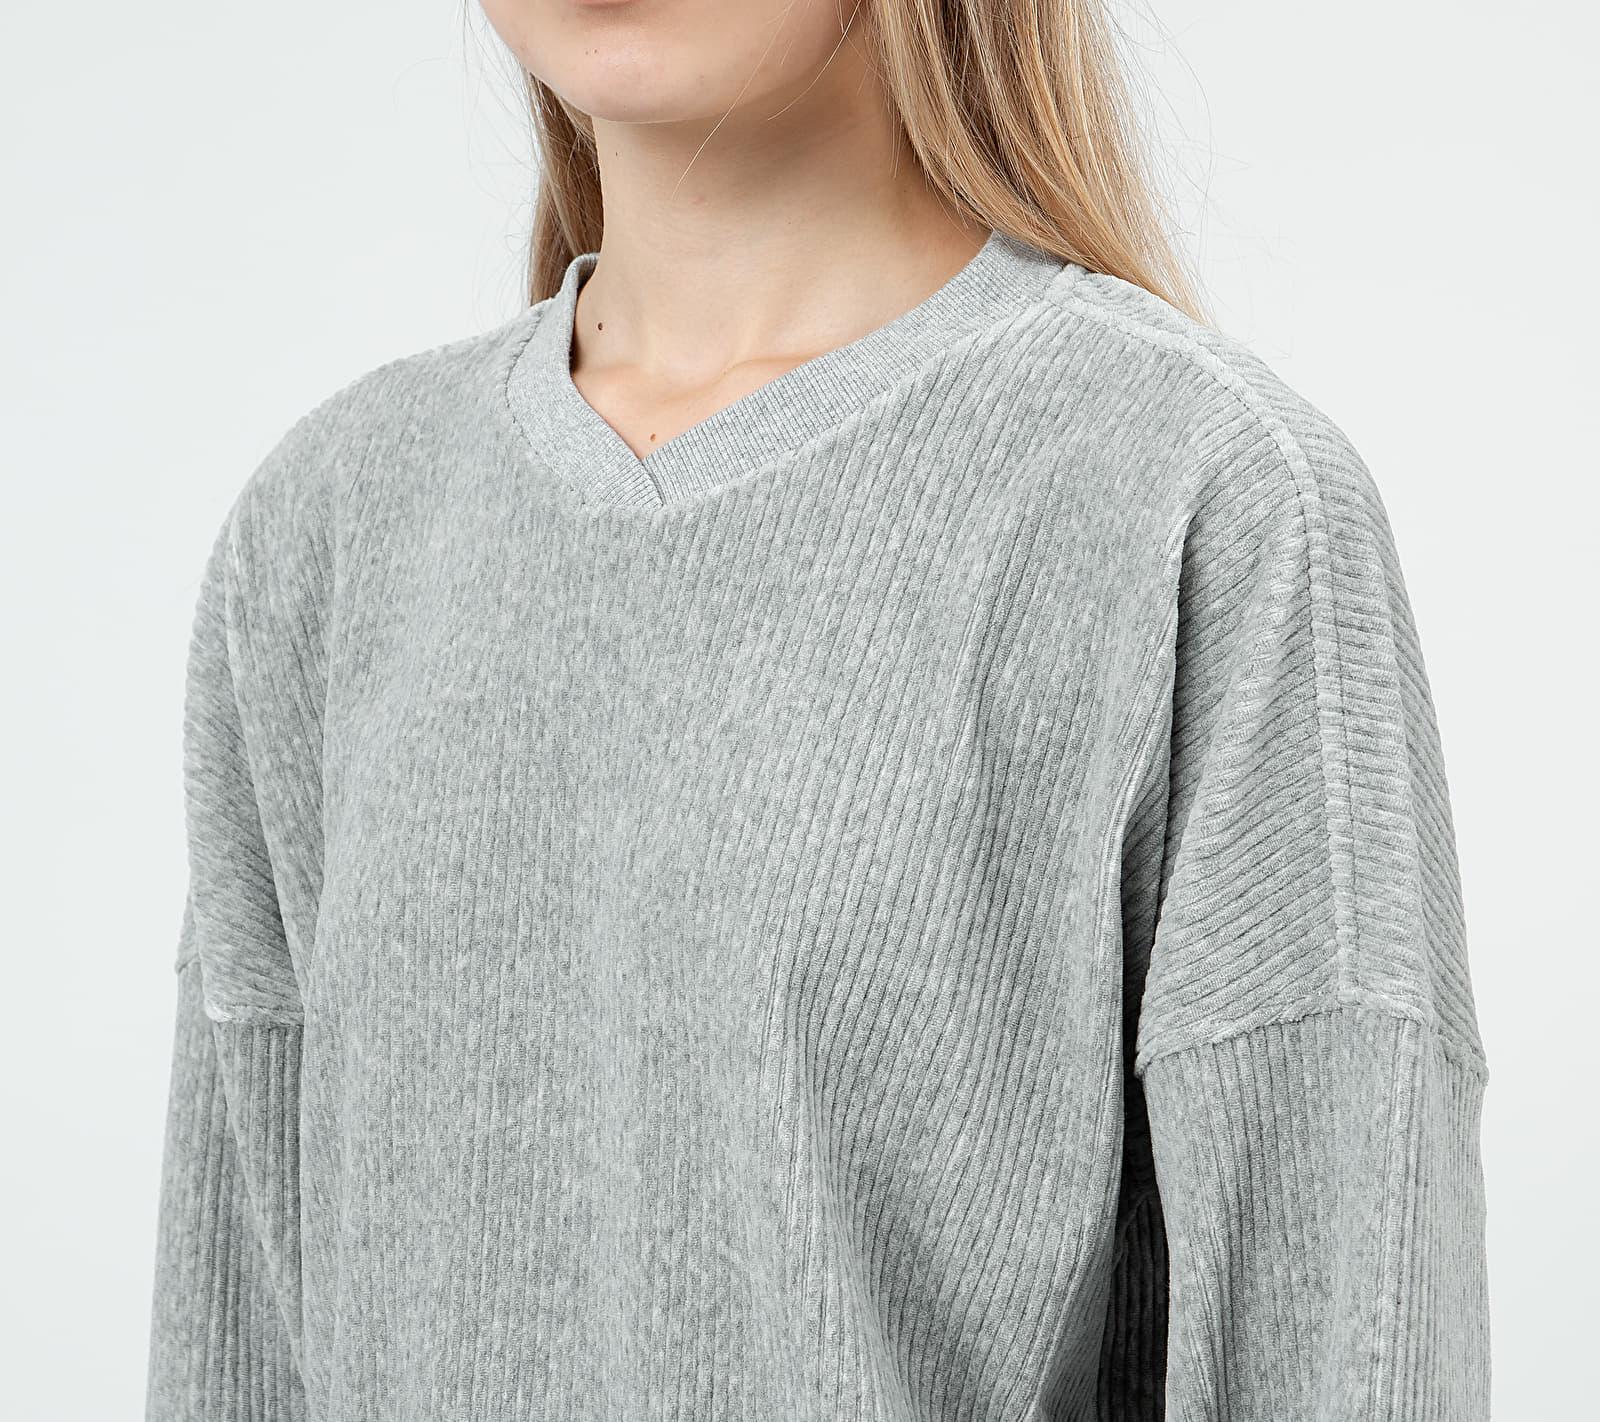 Calvin Klein Long Sleeve Lounge Sweatshirt Grey Heather, Gray